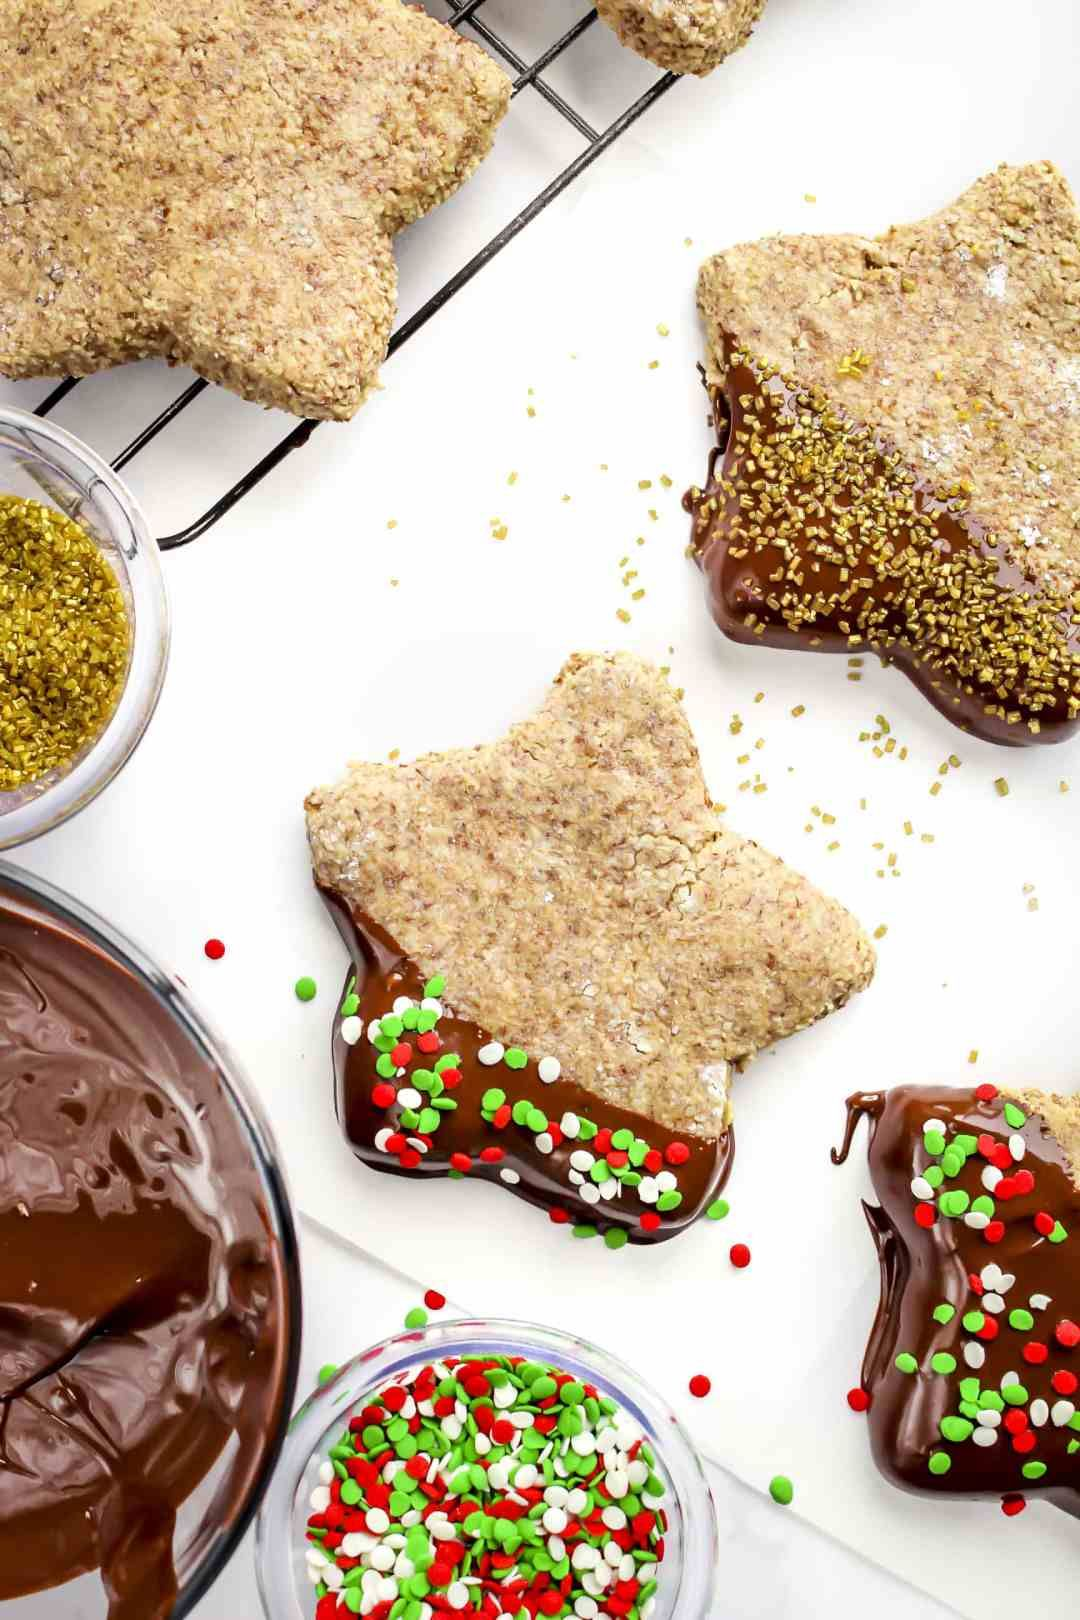 Cinnamon Stars Zimtsterne Are Classic German Christmas Cookies